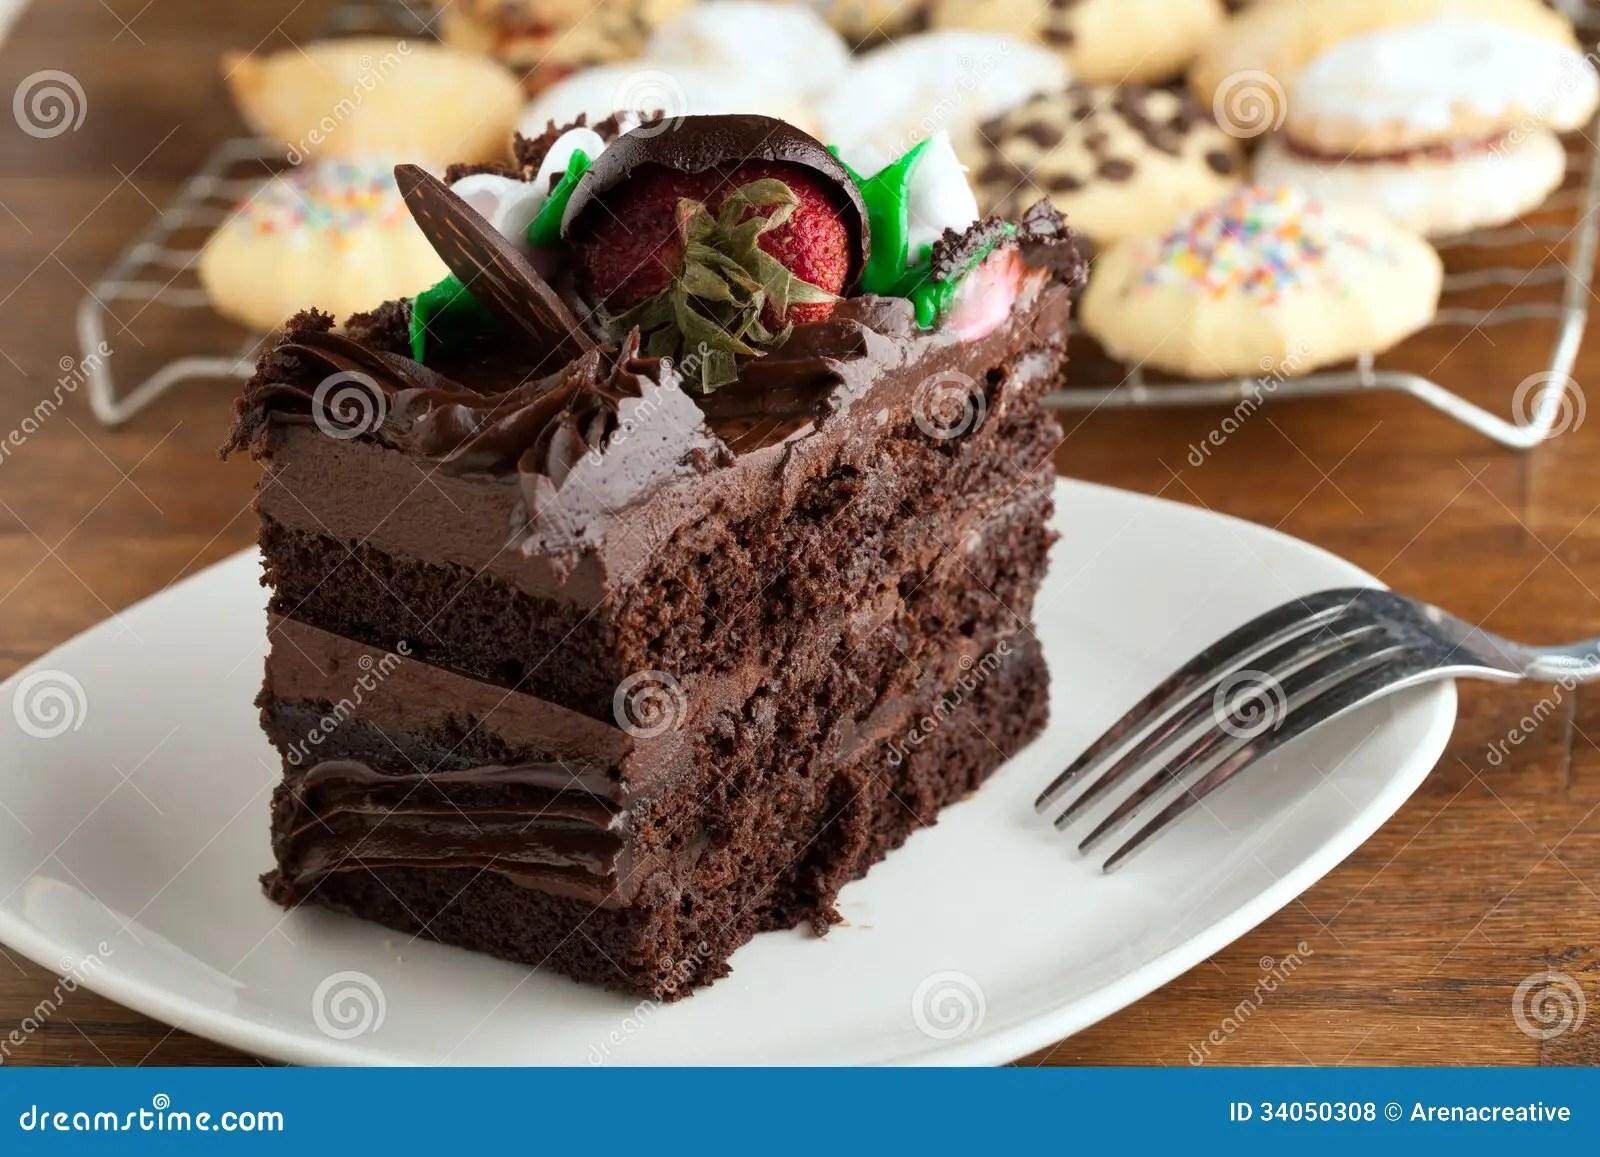 Chocolate Cake Slice With Cookies Stock Photo  Image of